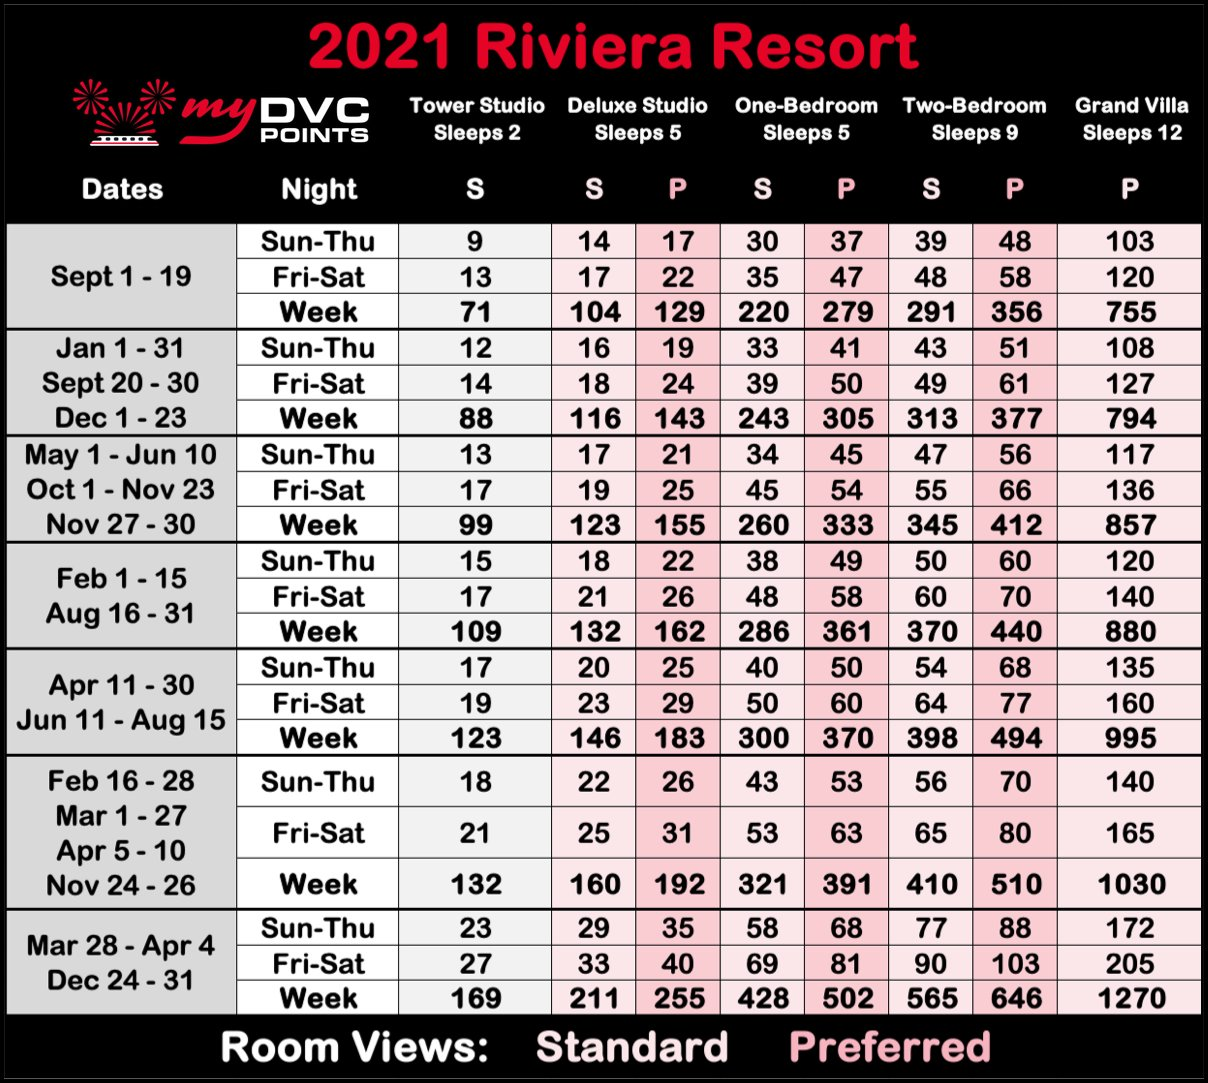 Disney's Riviera Resort 2021 Point Charts